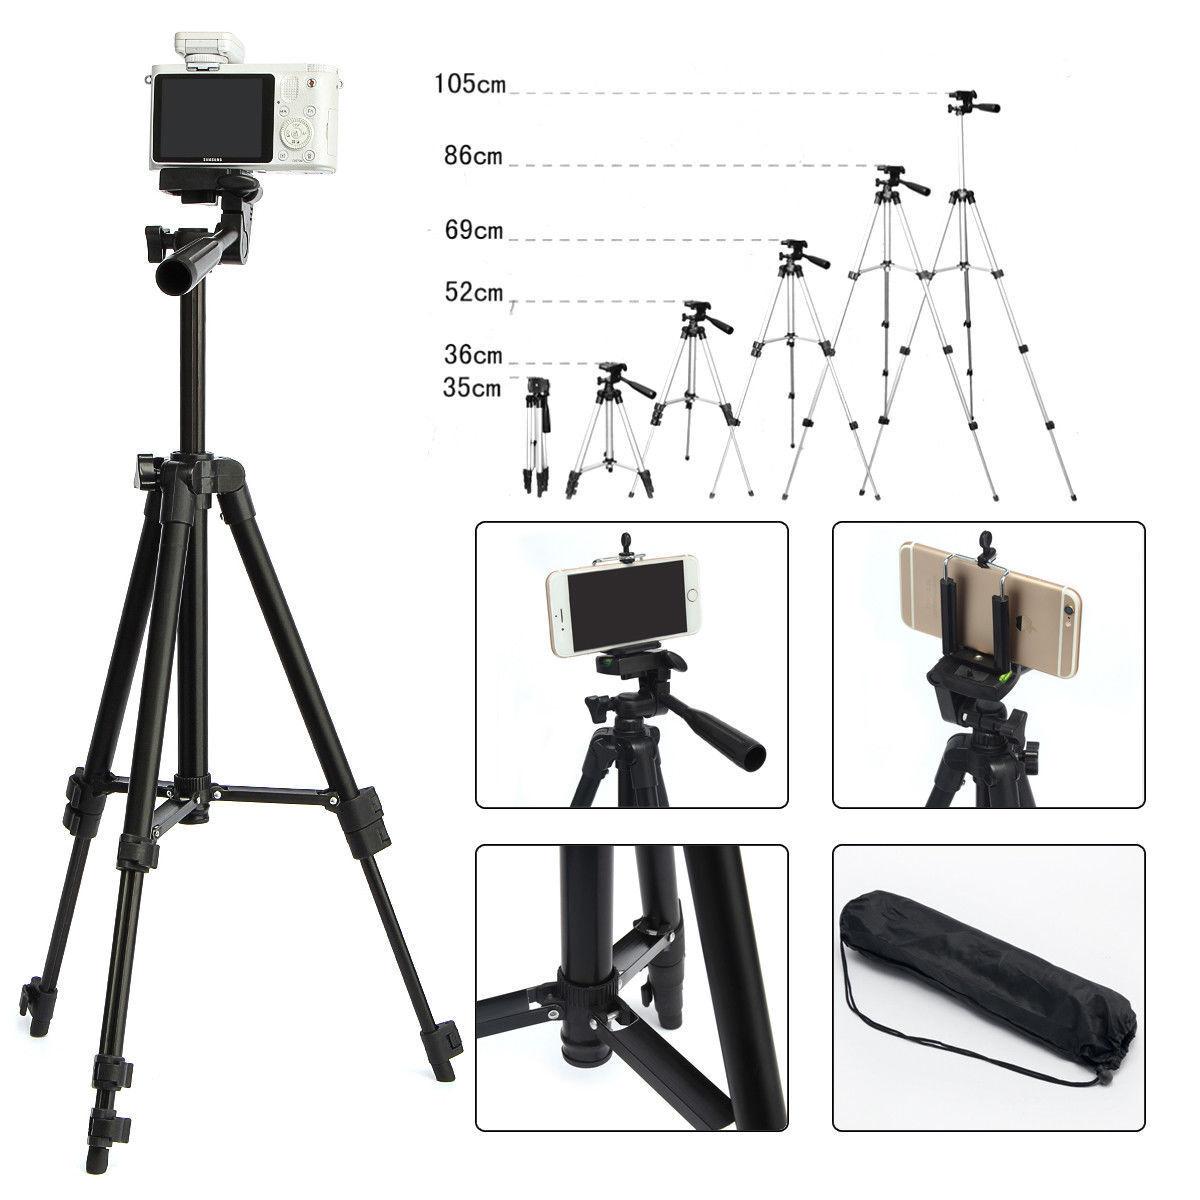 Professional Aluminium Camera Tripod Stand Holder for Samsung DSLR Cell Phone Black